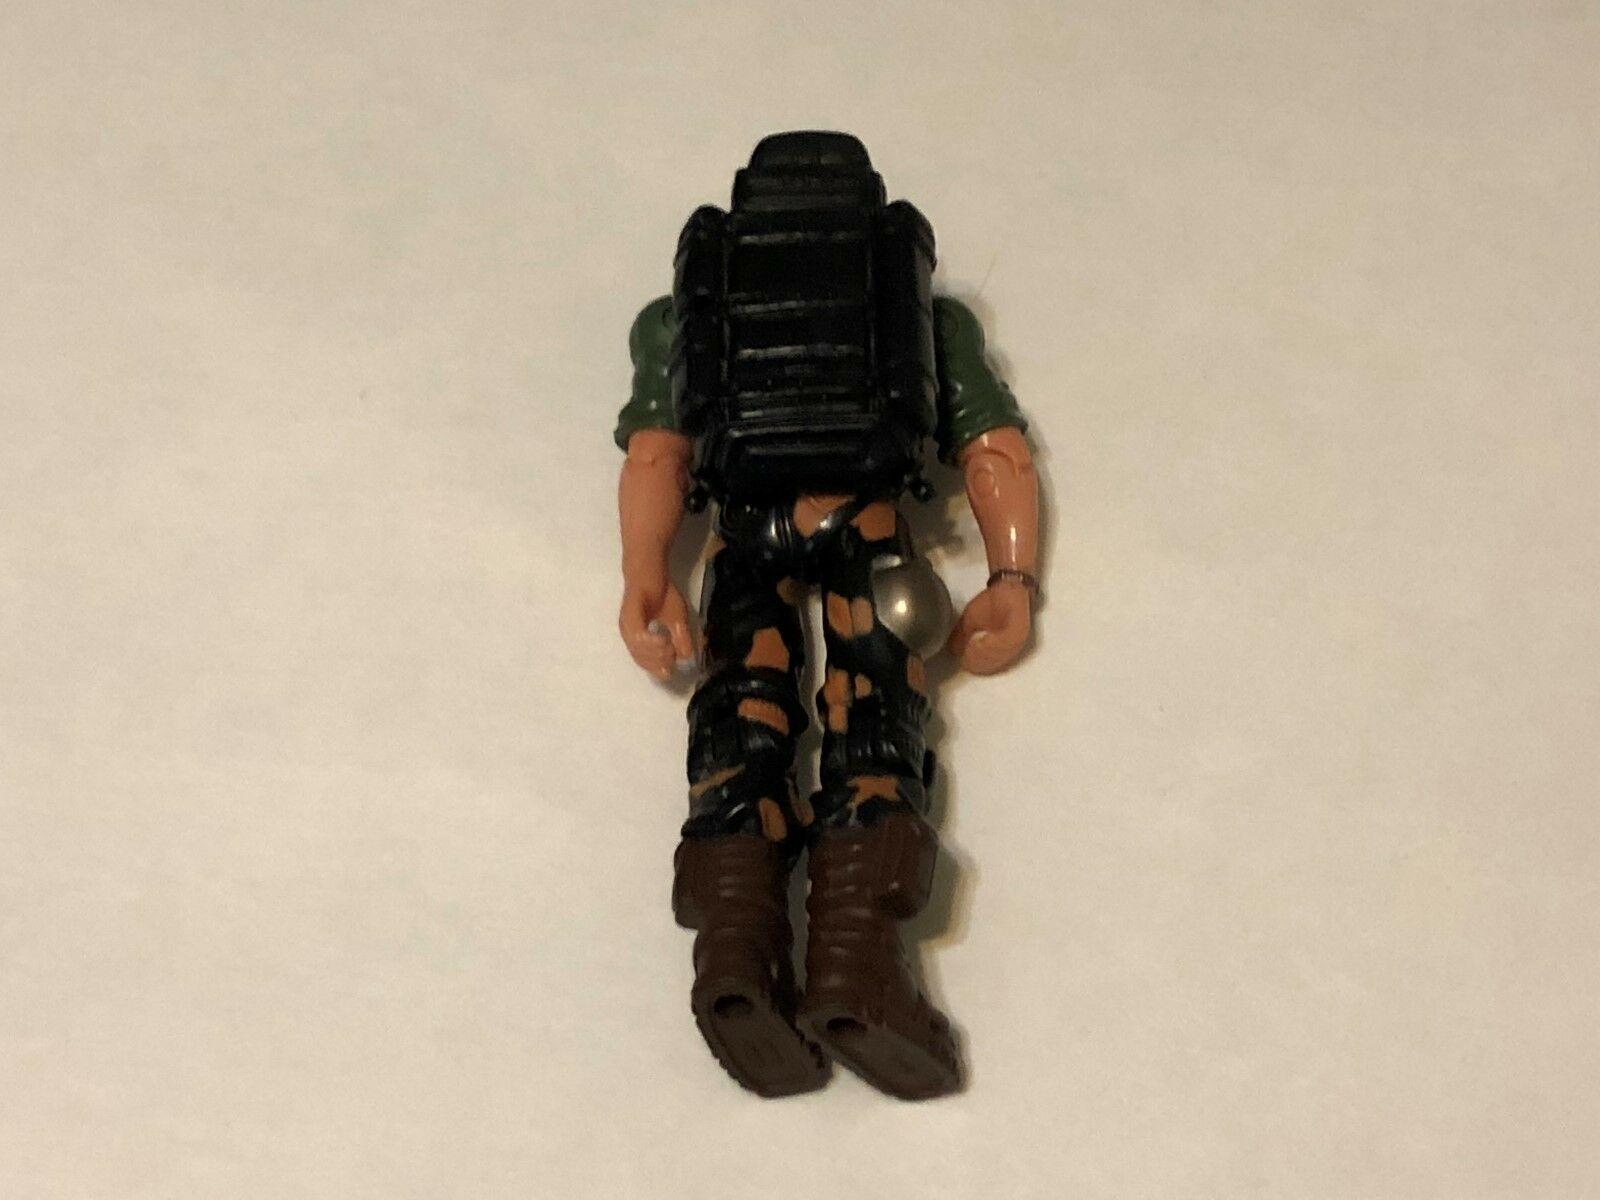 2003 Vintage Hasbro G.I. Joe Flint Action Figure (Ref # 18-54)